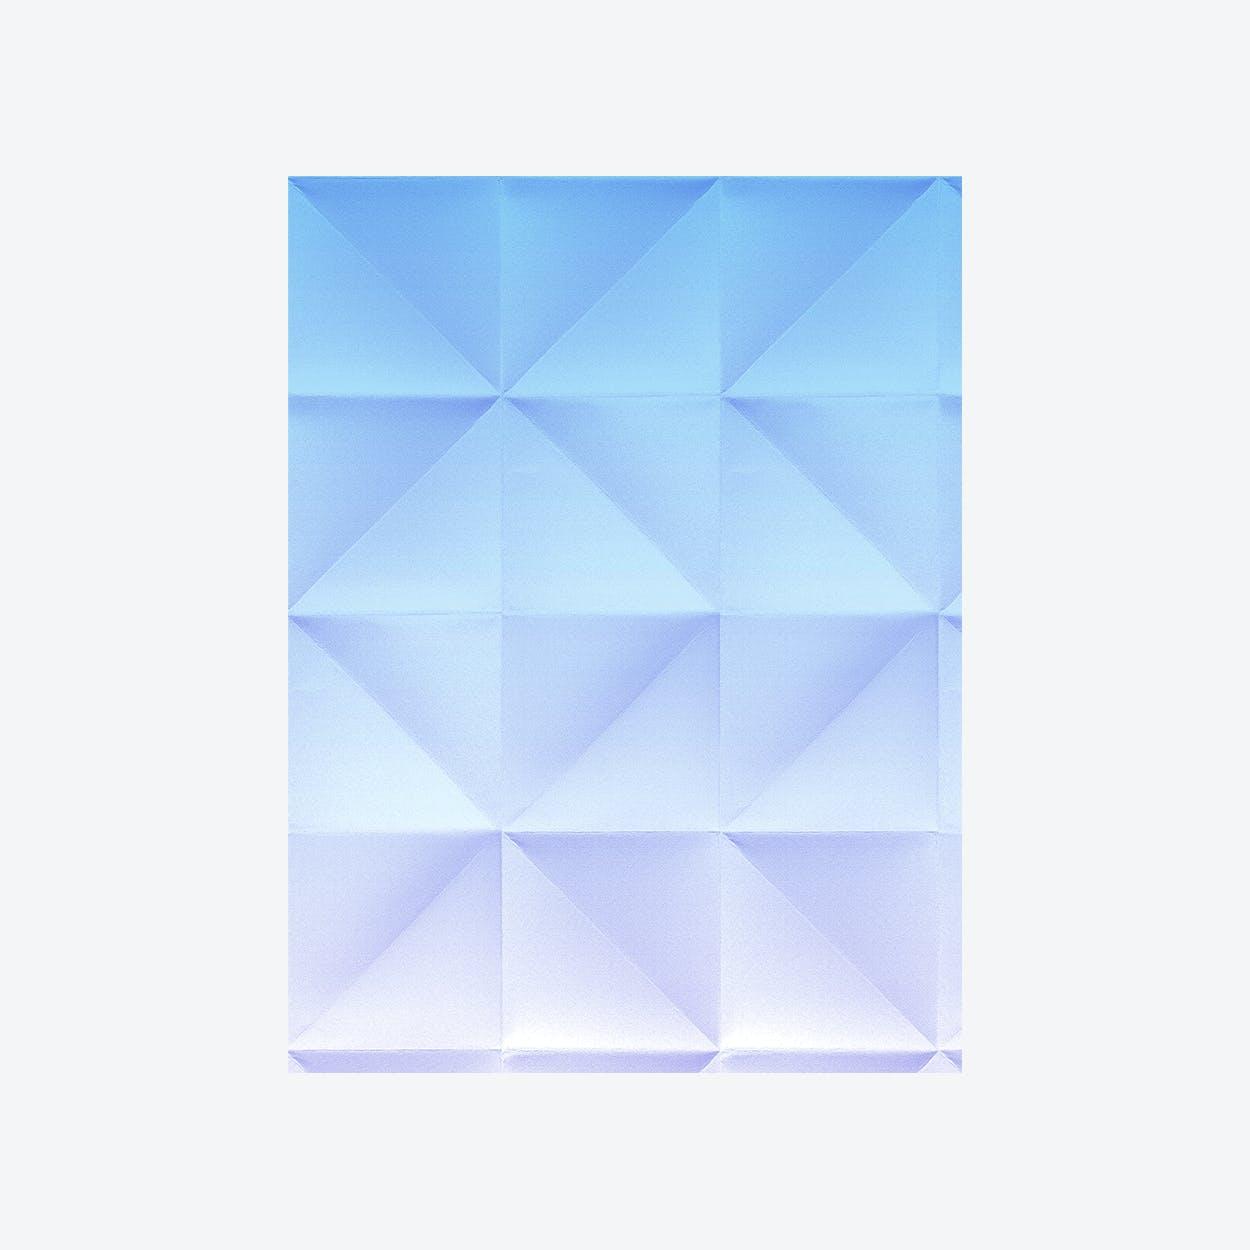 Floating - Wallpapper - Gradient Blue